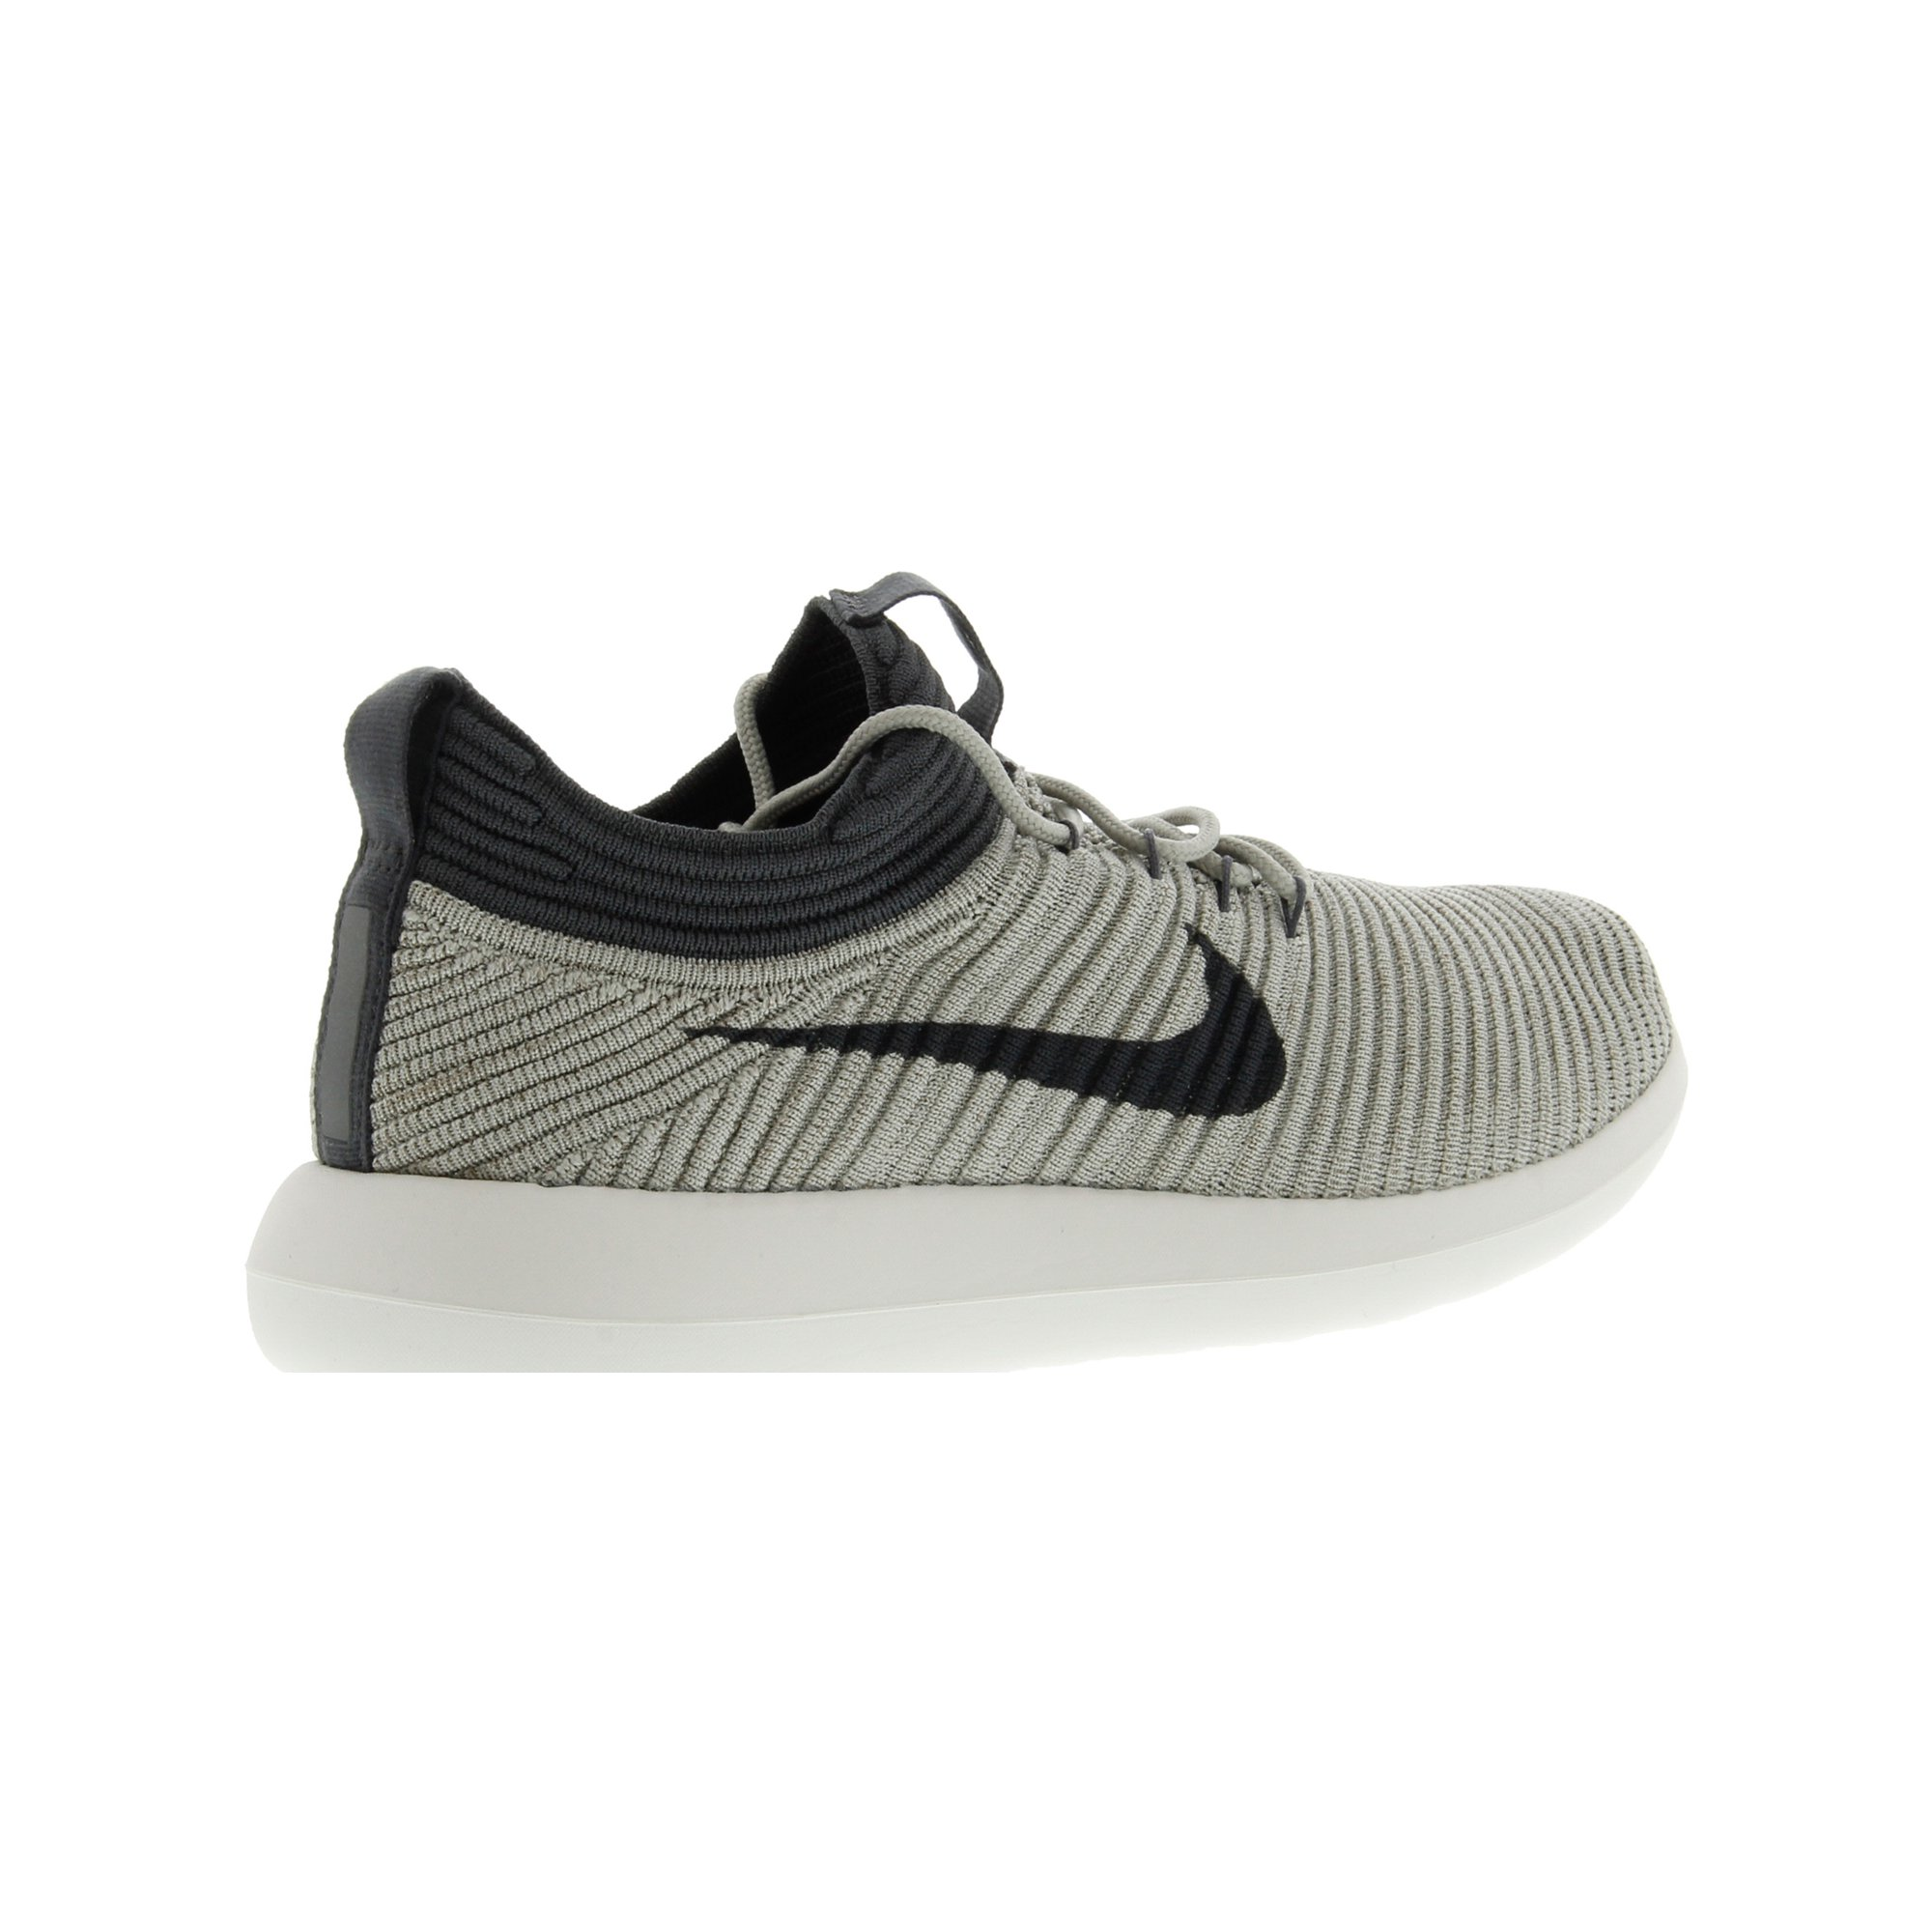 417eaa148222 Nike Women s Roshe Two Flyknit V2 College Navy   Sail Ankle-High Running  Shoe - 8.5M